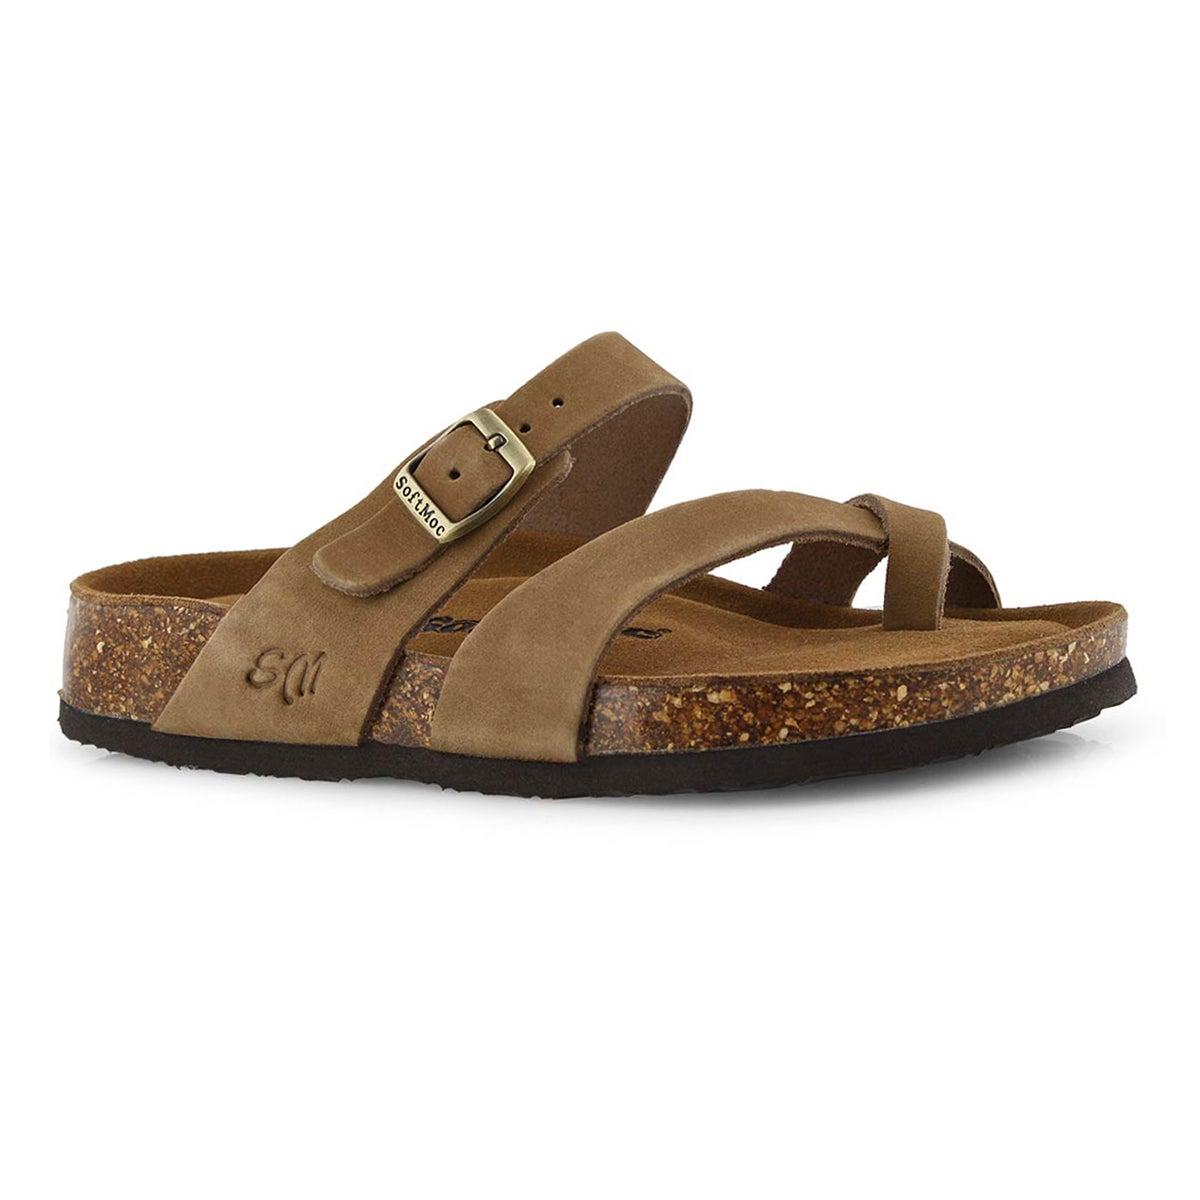 Lds Alicia 5 stone mem foam sandal